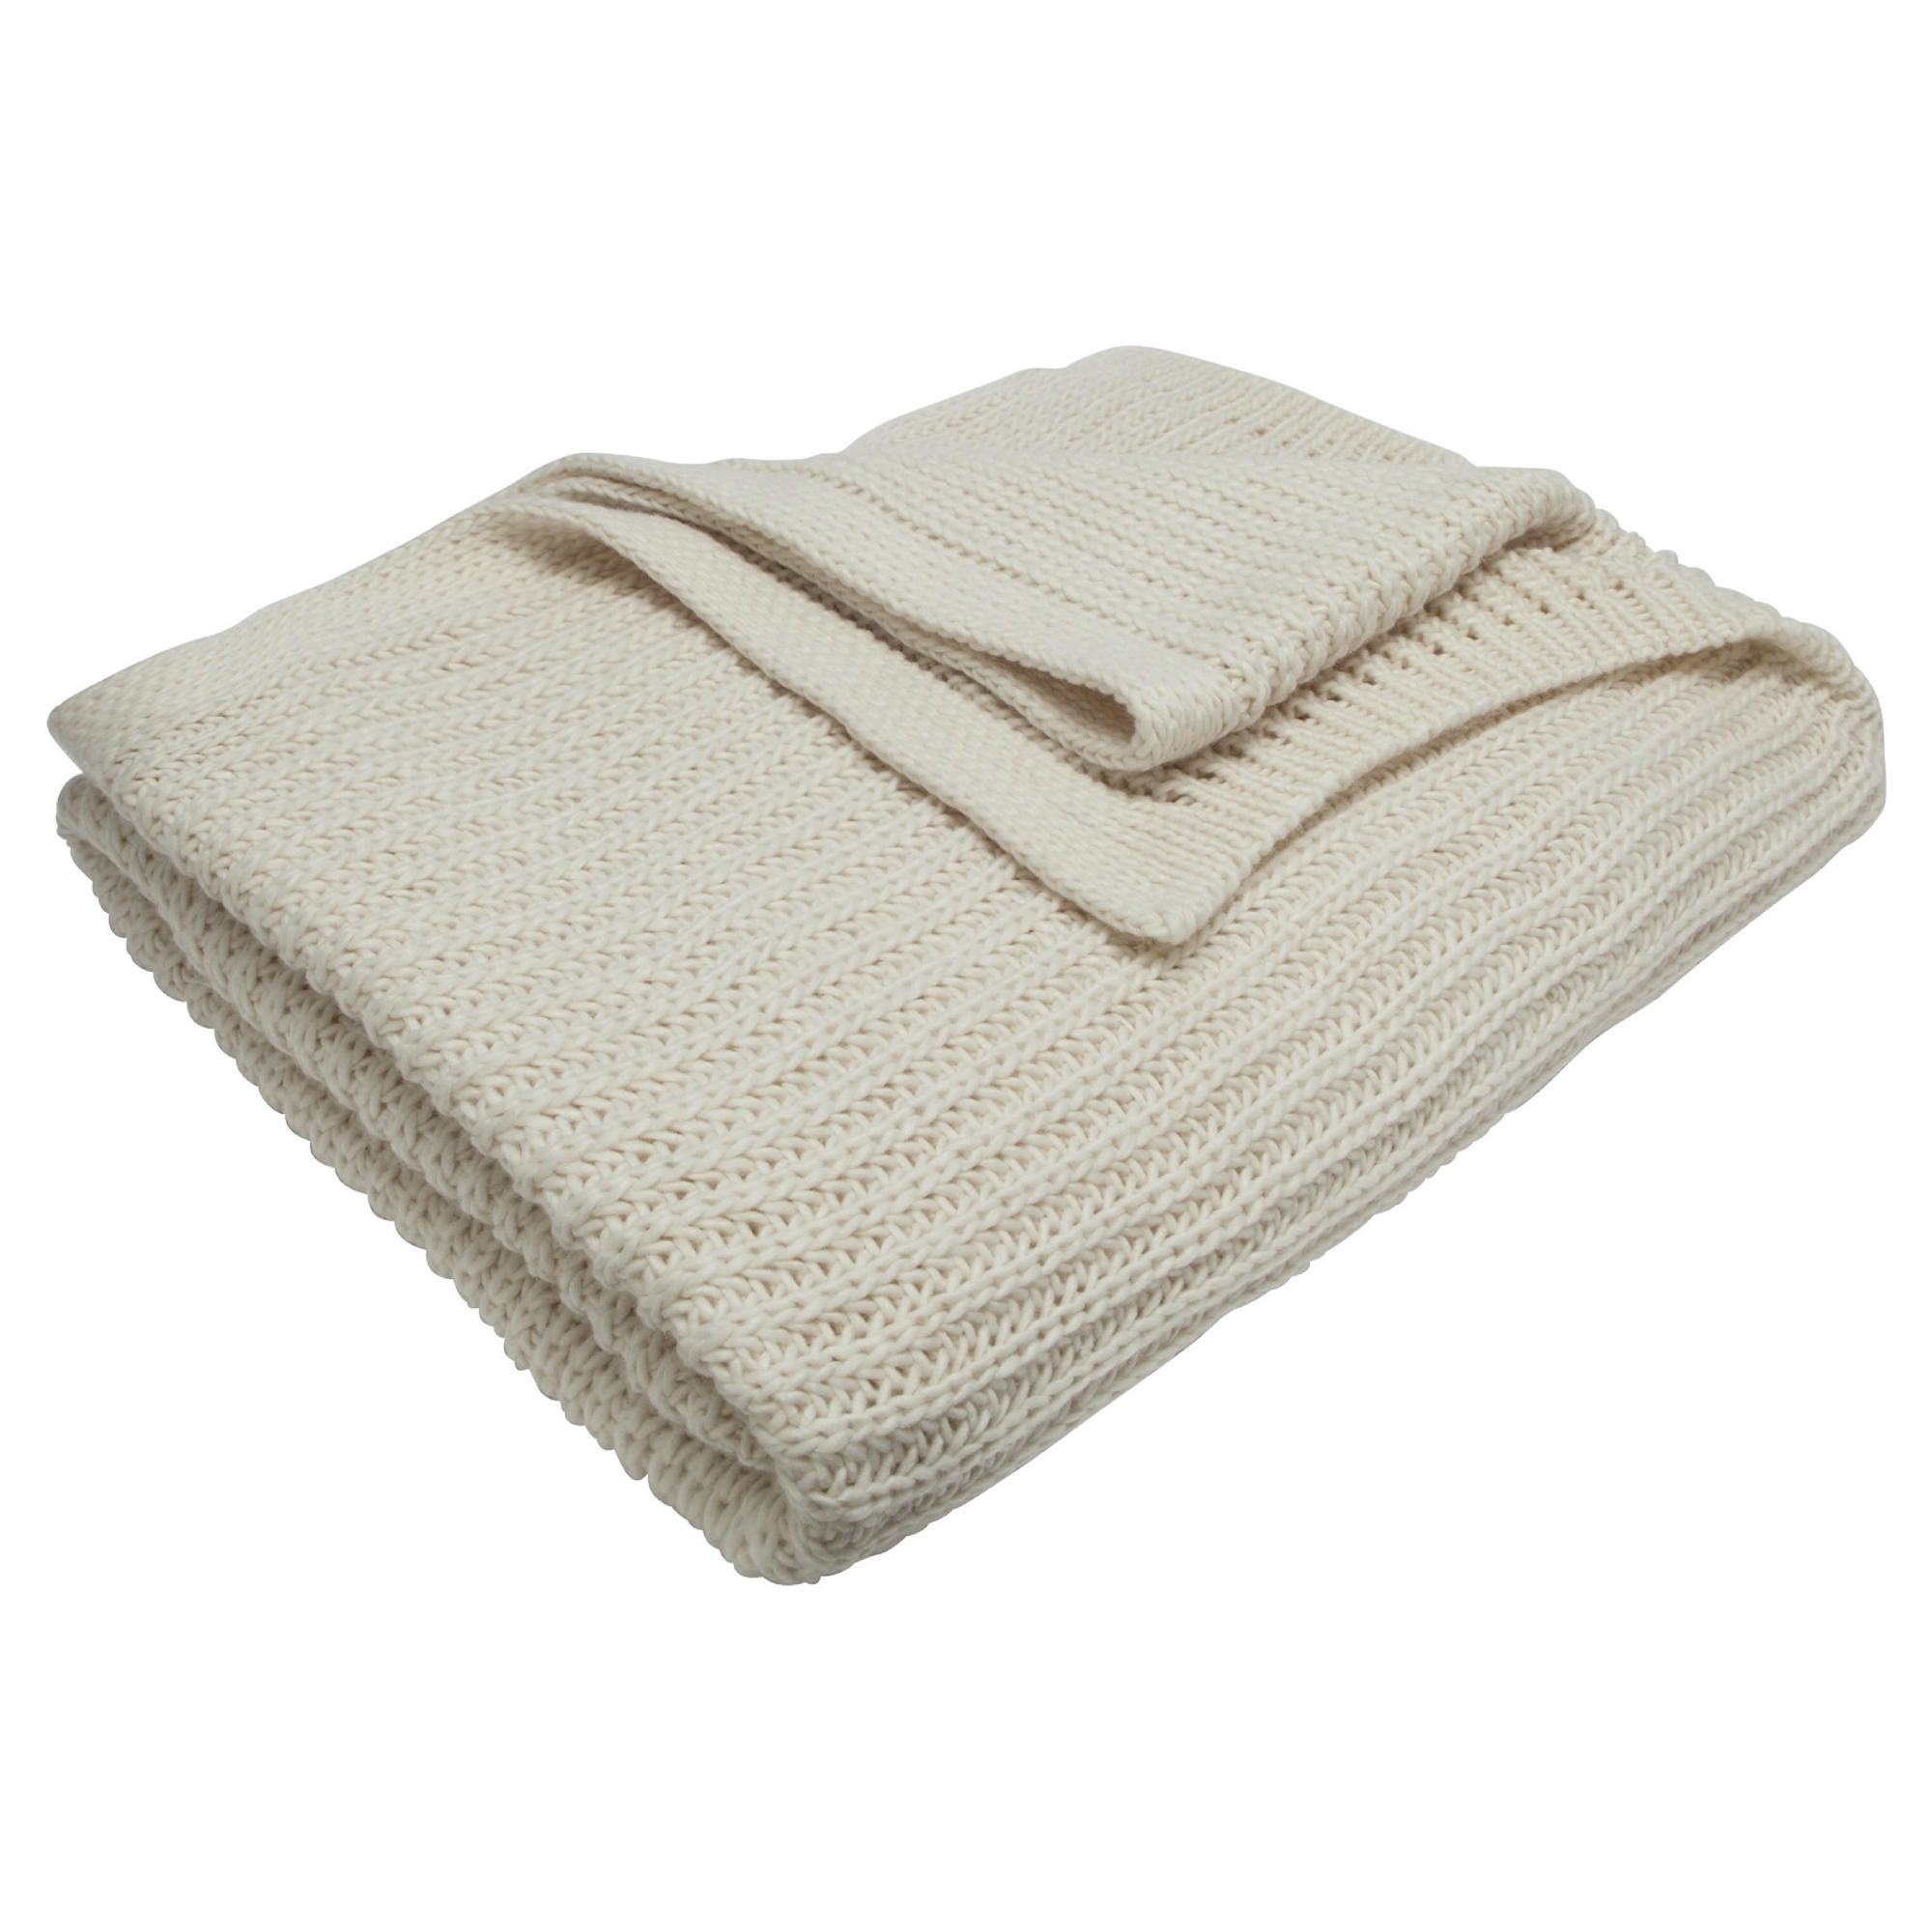 Tesco Chunky Knit Throw Cream